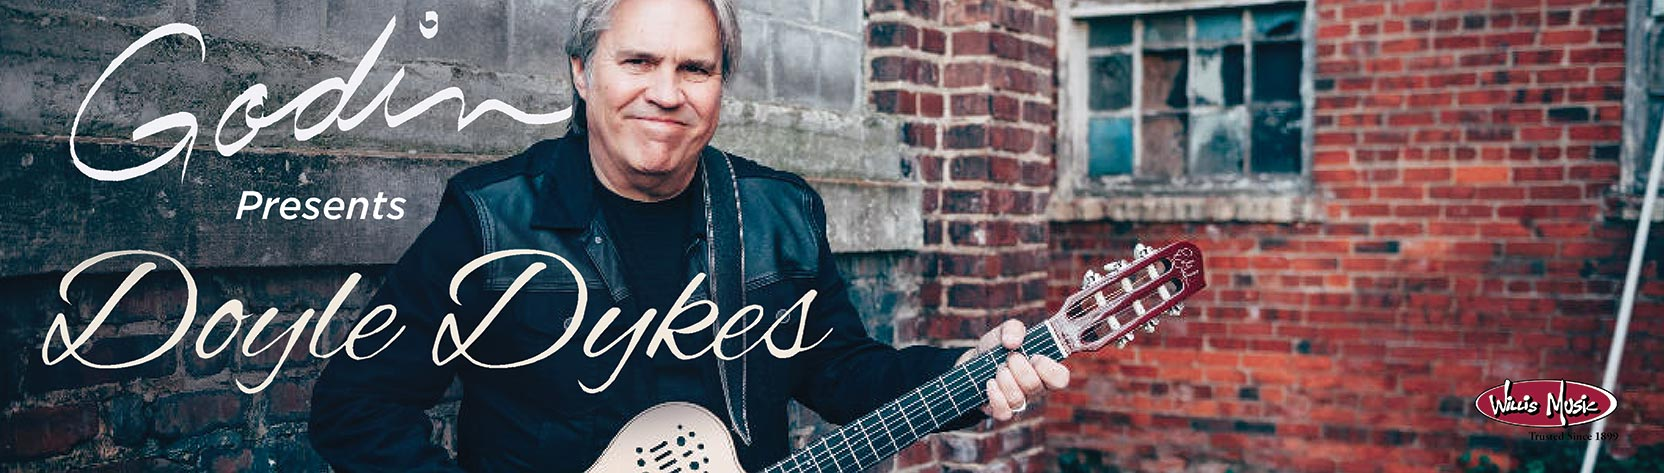 Doyle Dykes Concert Banner